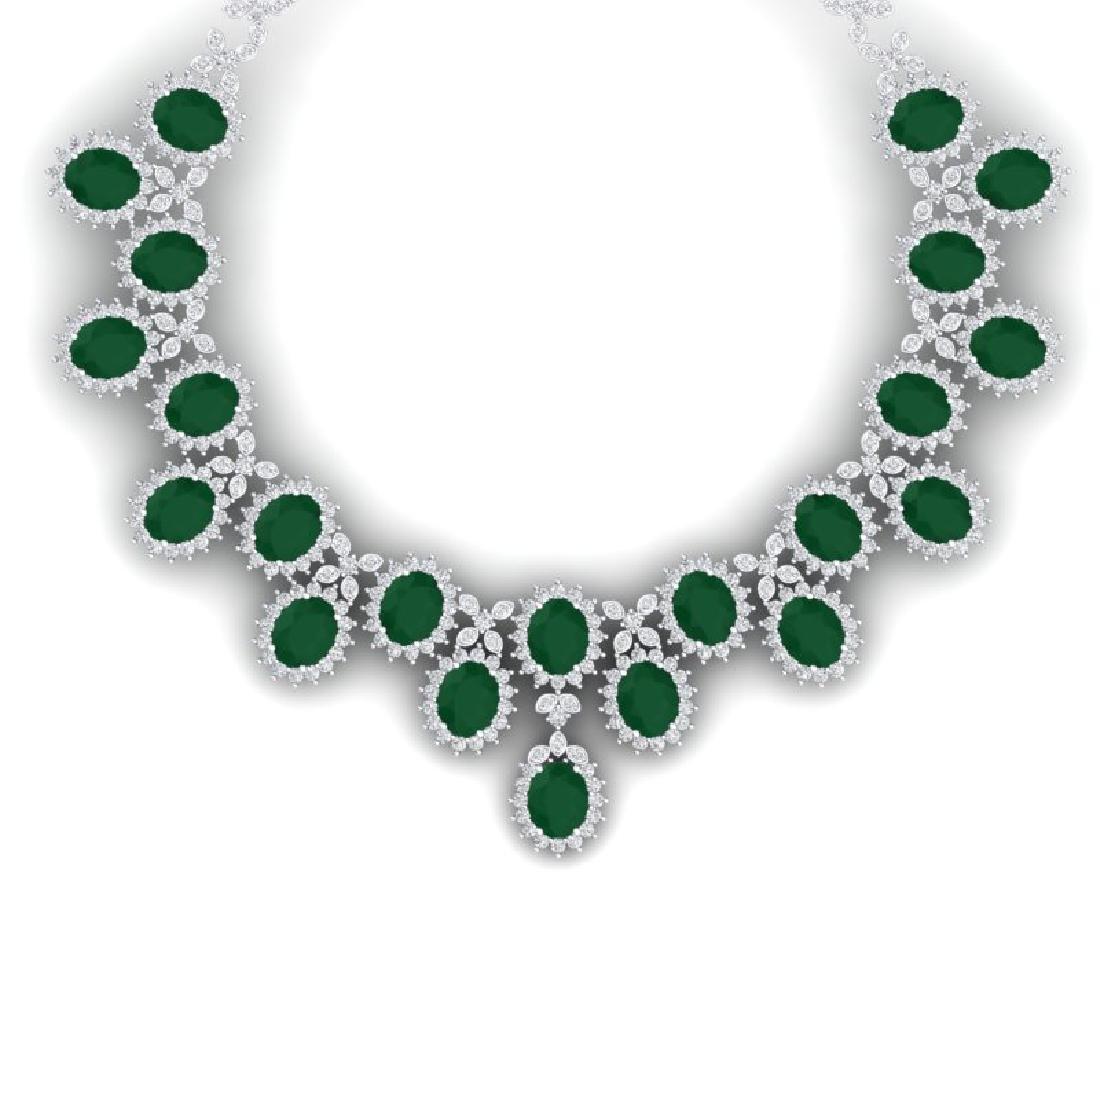 81 CTW Royalty Emerald & VS Diamond Necklace 18K White